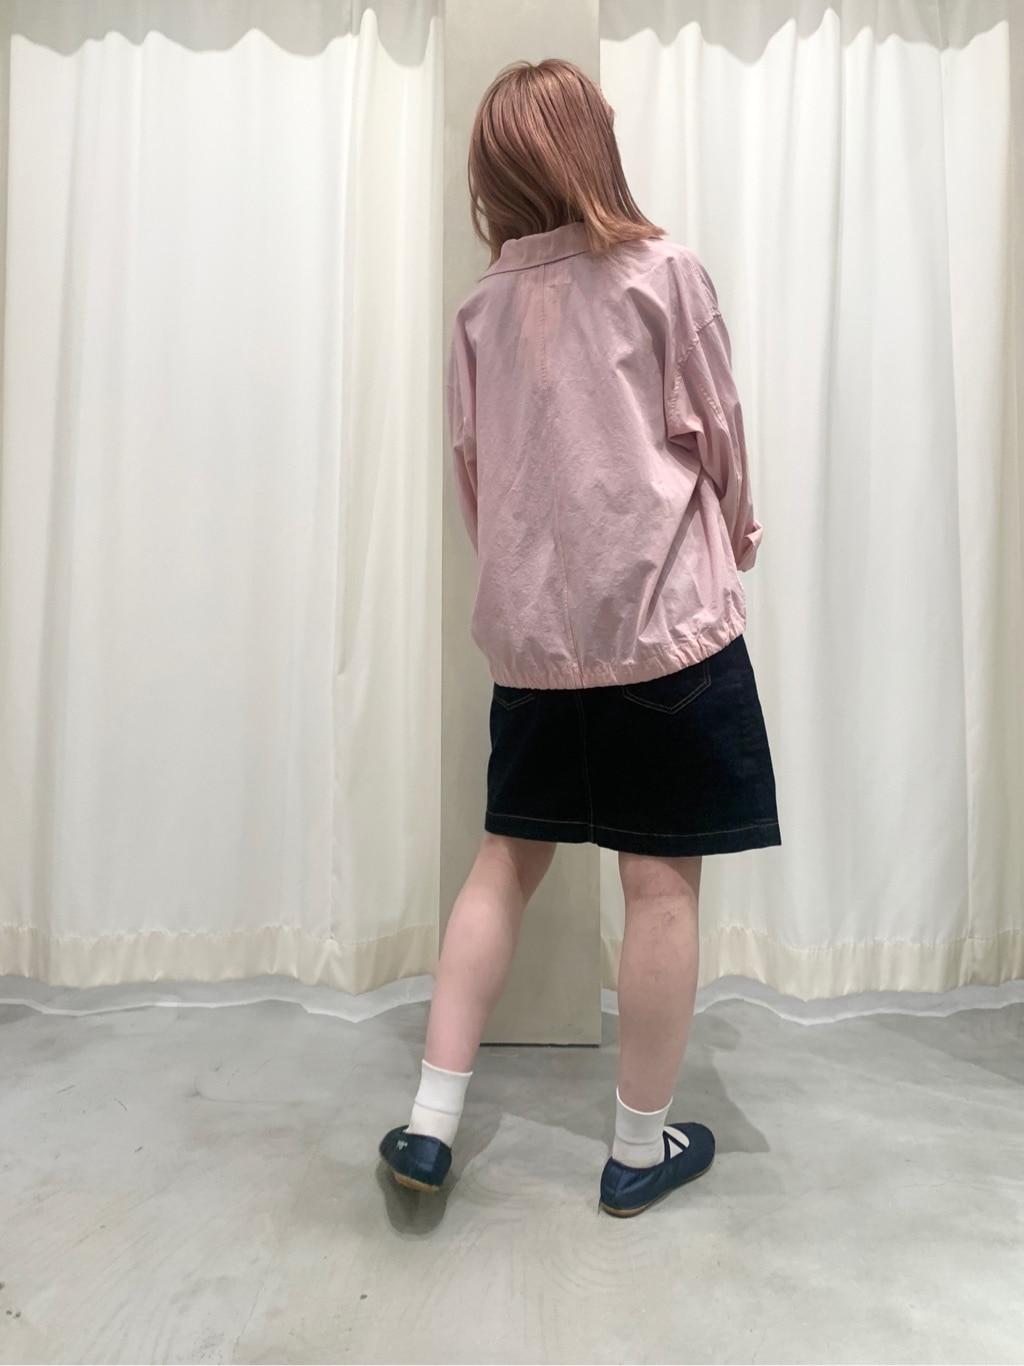 - CHILD WOMAN CHILD WOMAN , PAR ICI 東京スカイツリータウン・ソラマチ 身長:160cm 2021.05.13